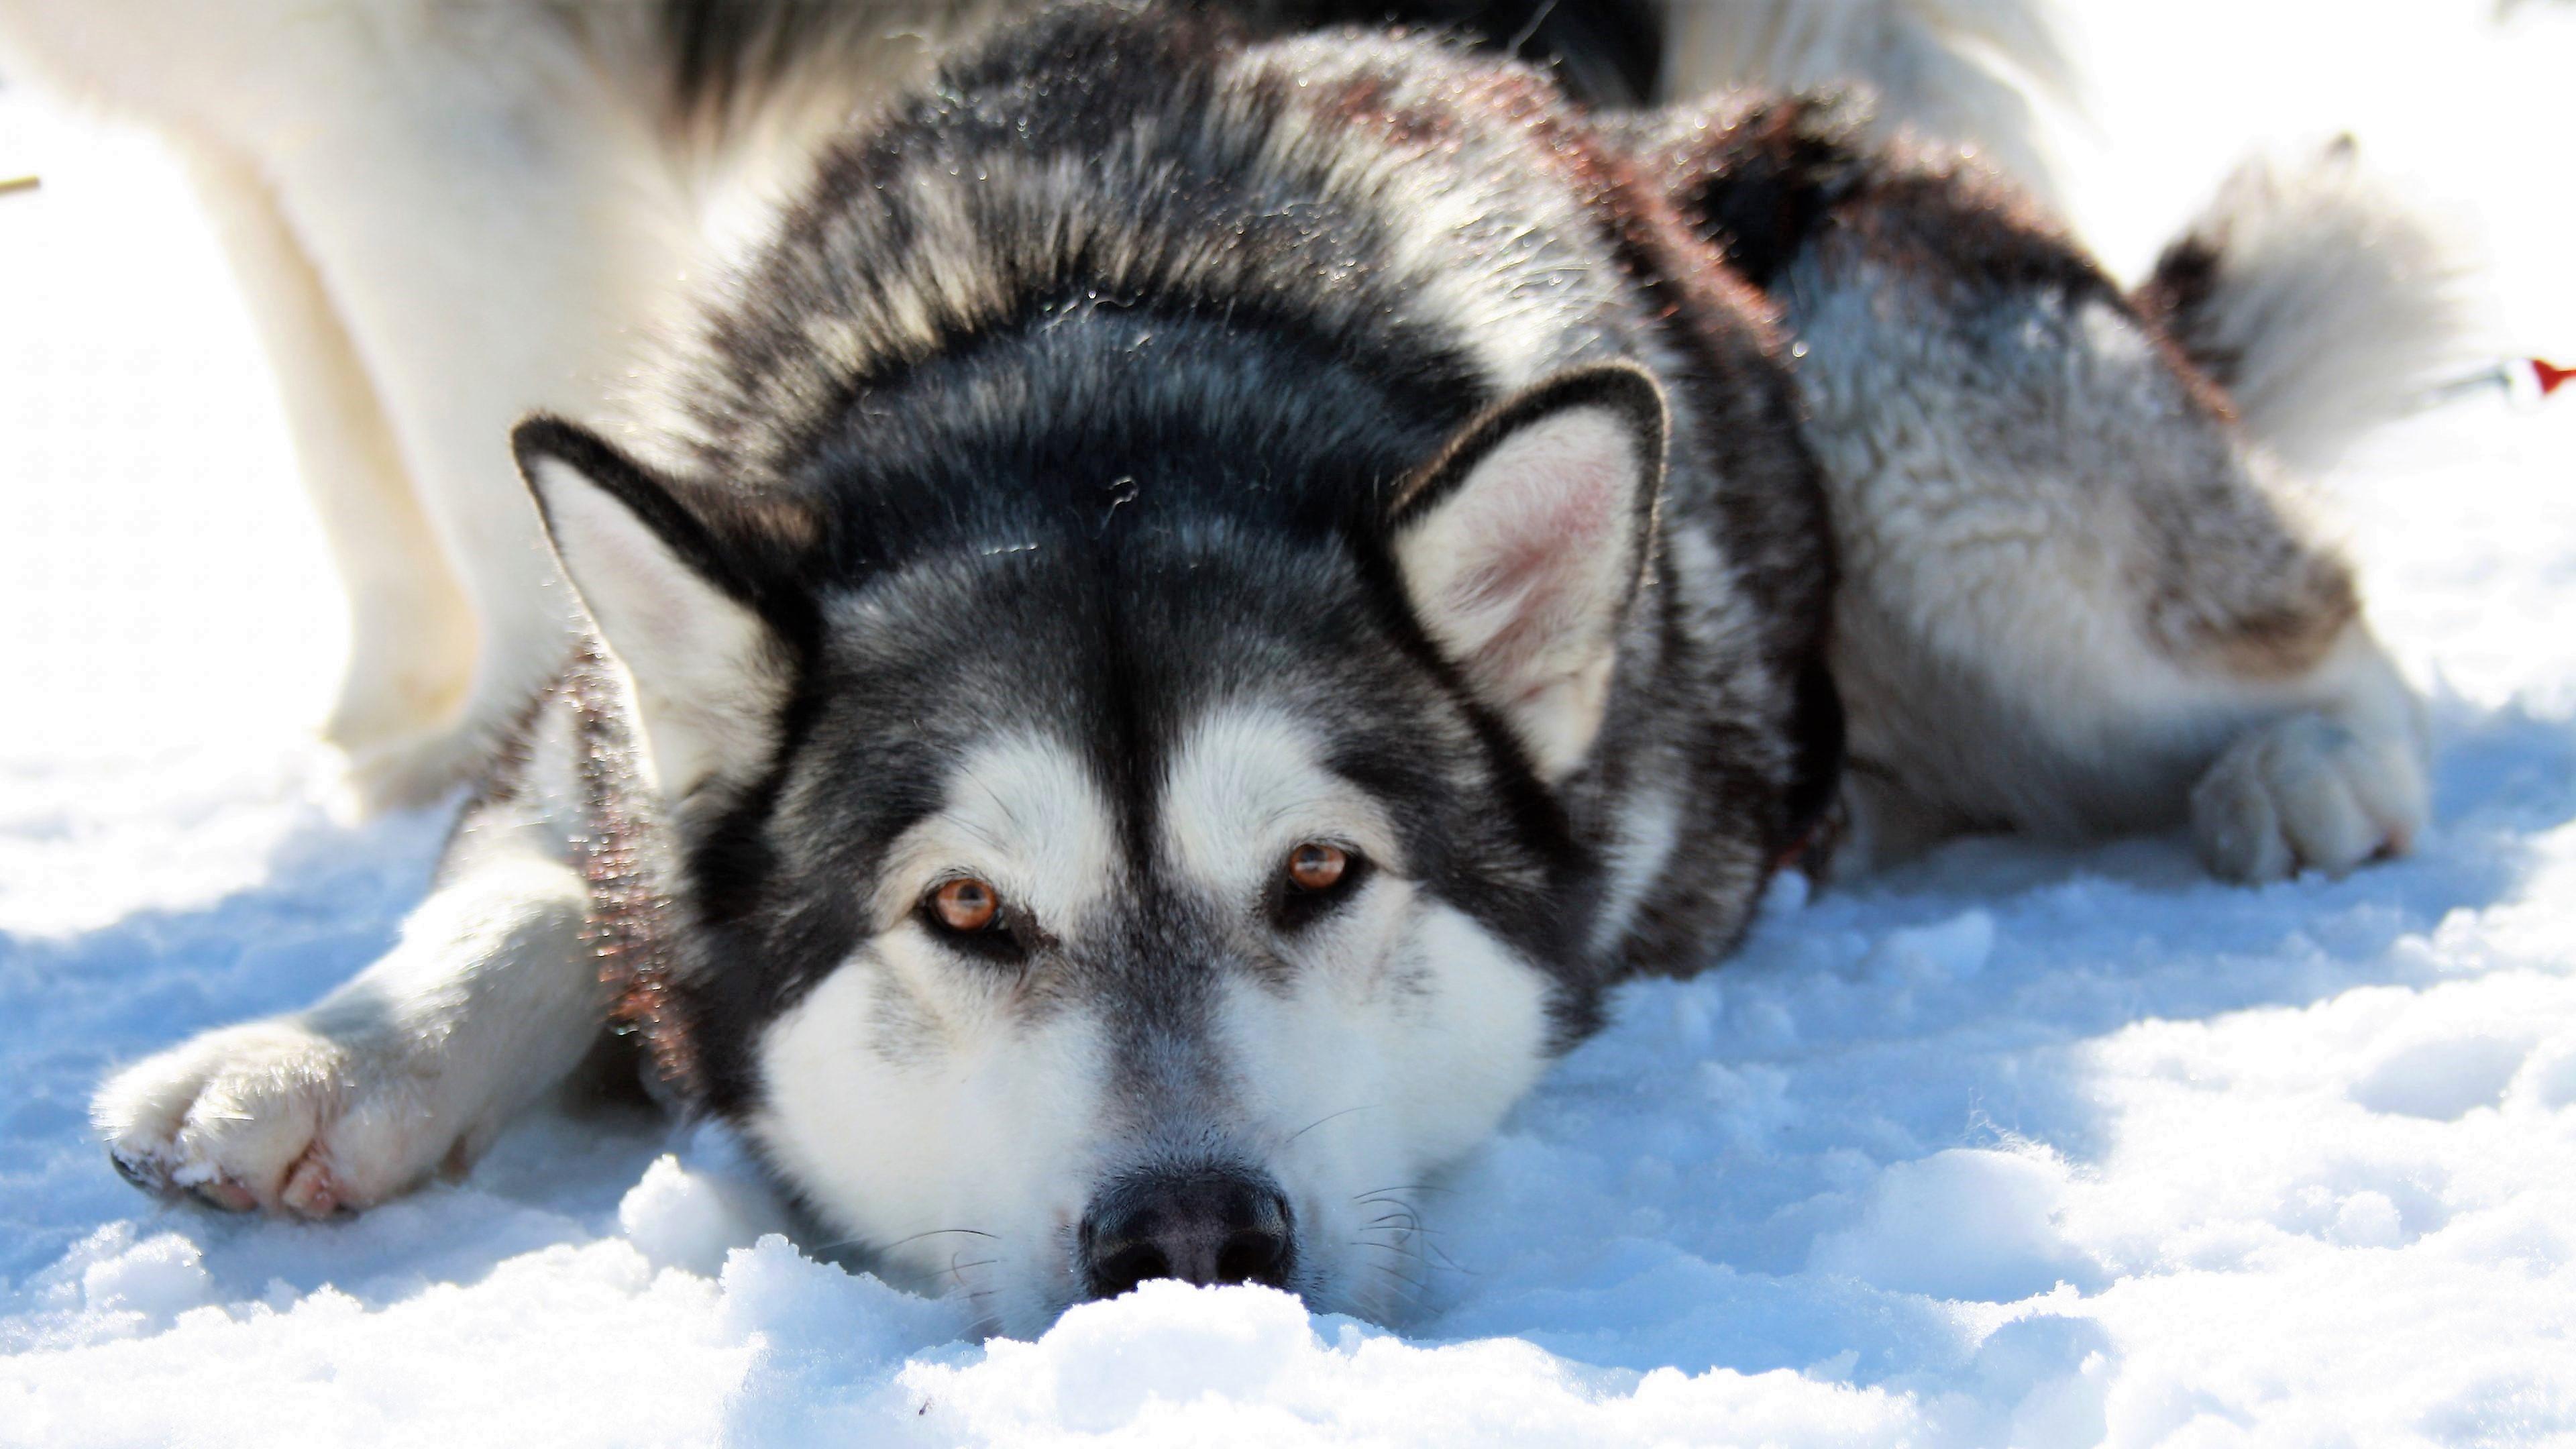 Husky Dog Hd Wallpapers Siberian Husky 4k Ultra Hd Wallpaper Background Image